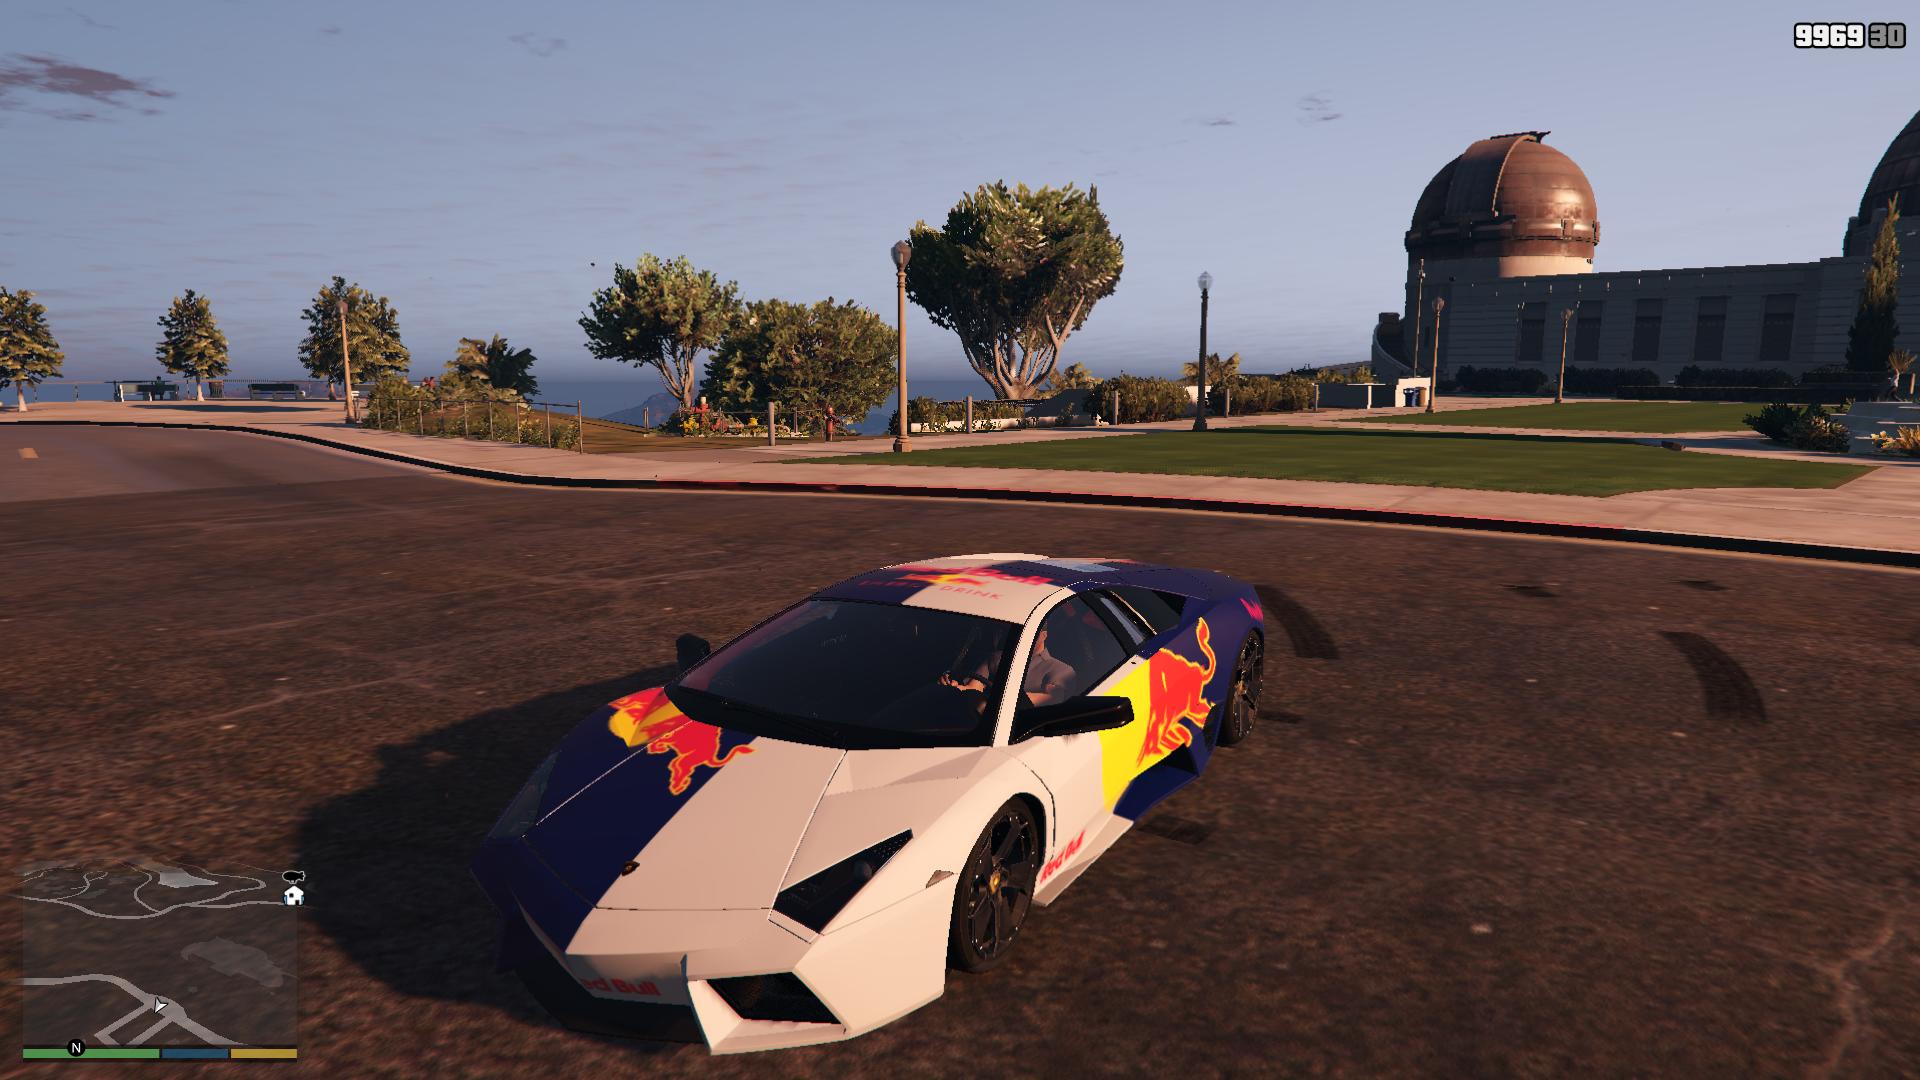 Tron Ksi Lamborghini Aventador Livery Gta5 Mods Com